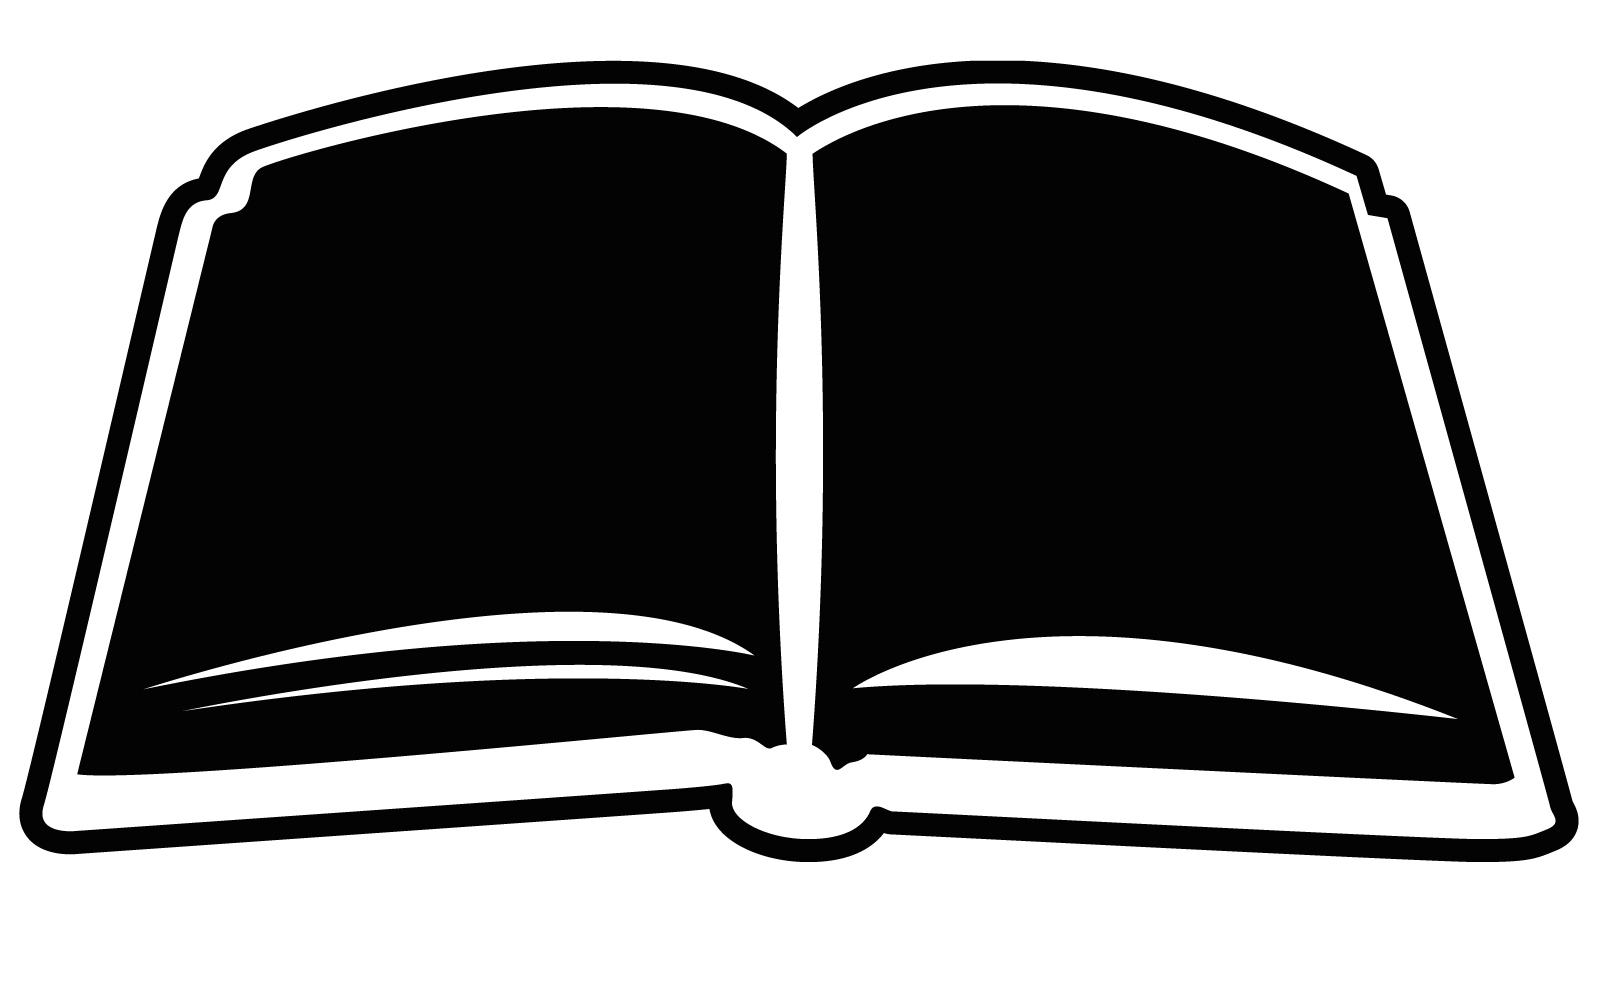 Open Book Clipart.